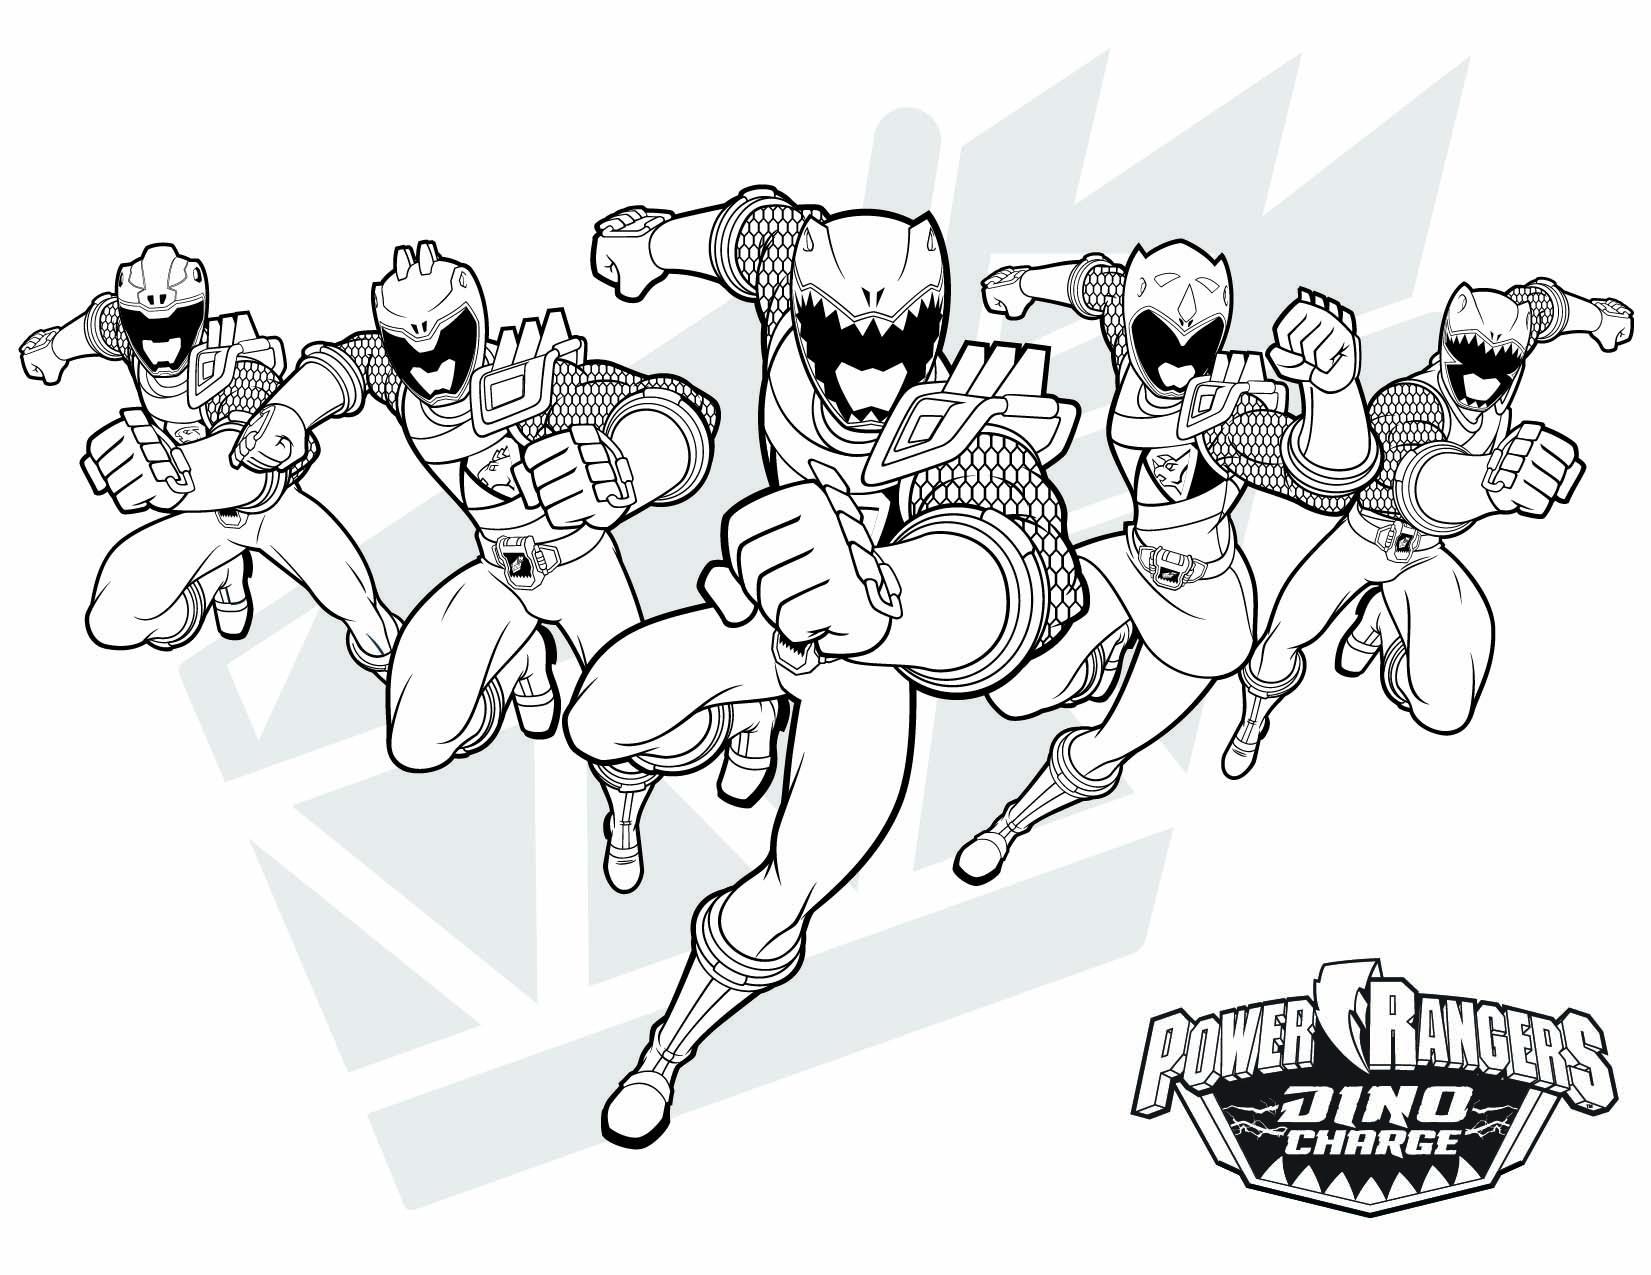 14 Beau De Coloriage Power Rangers Dino Charge Photos